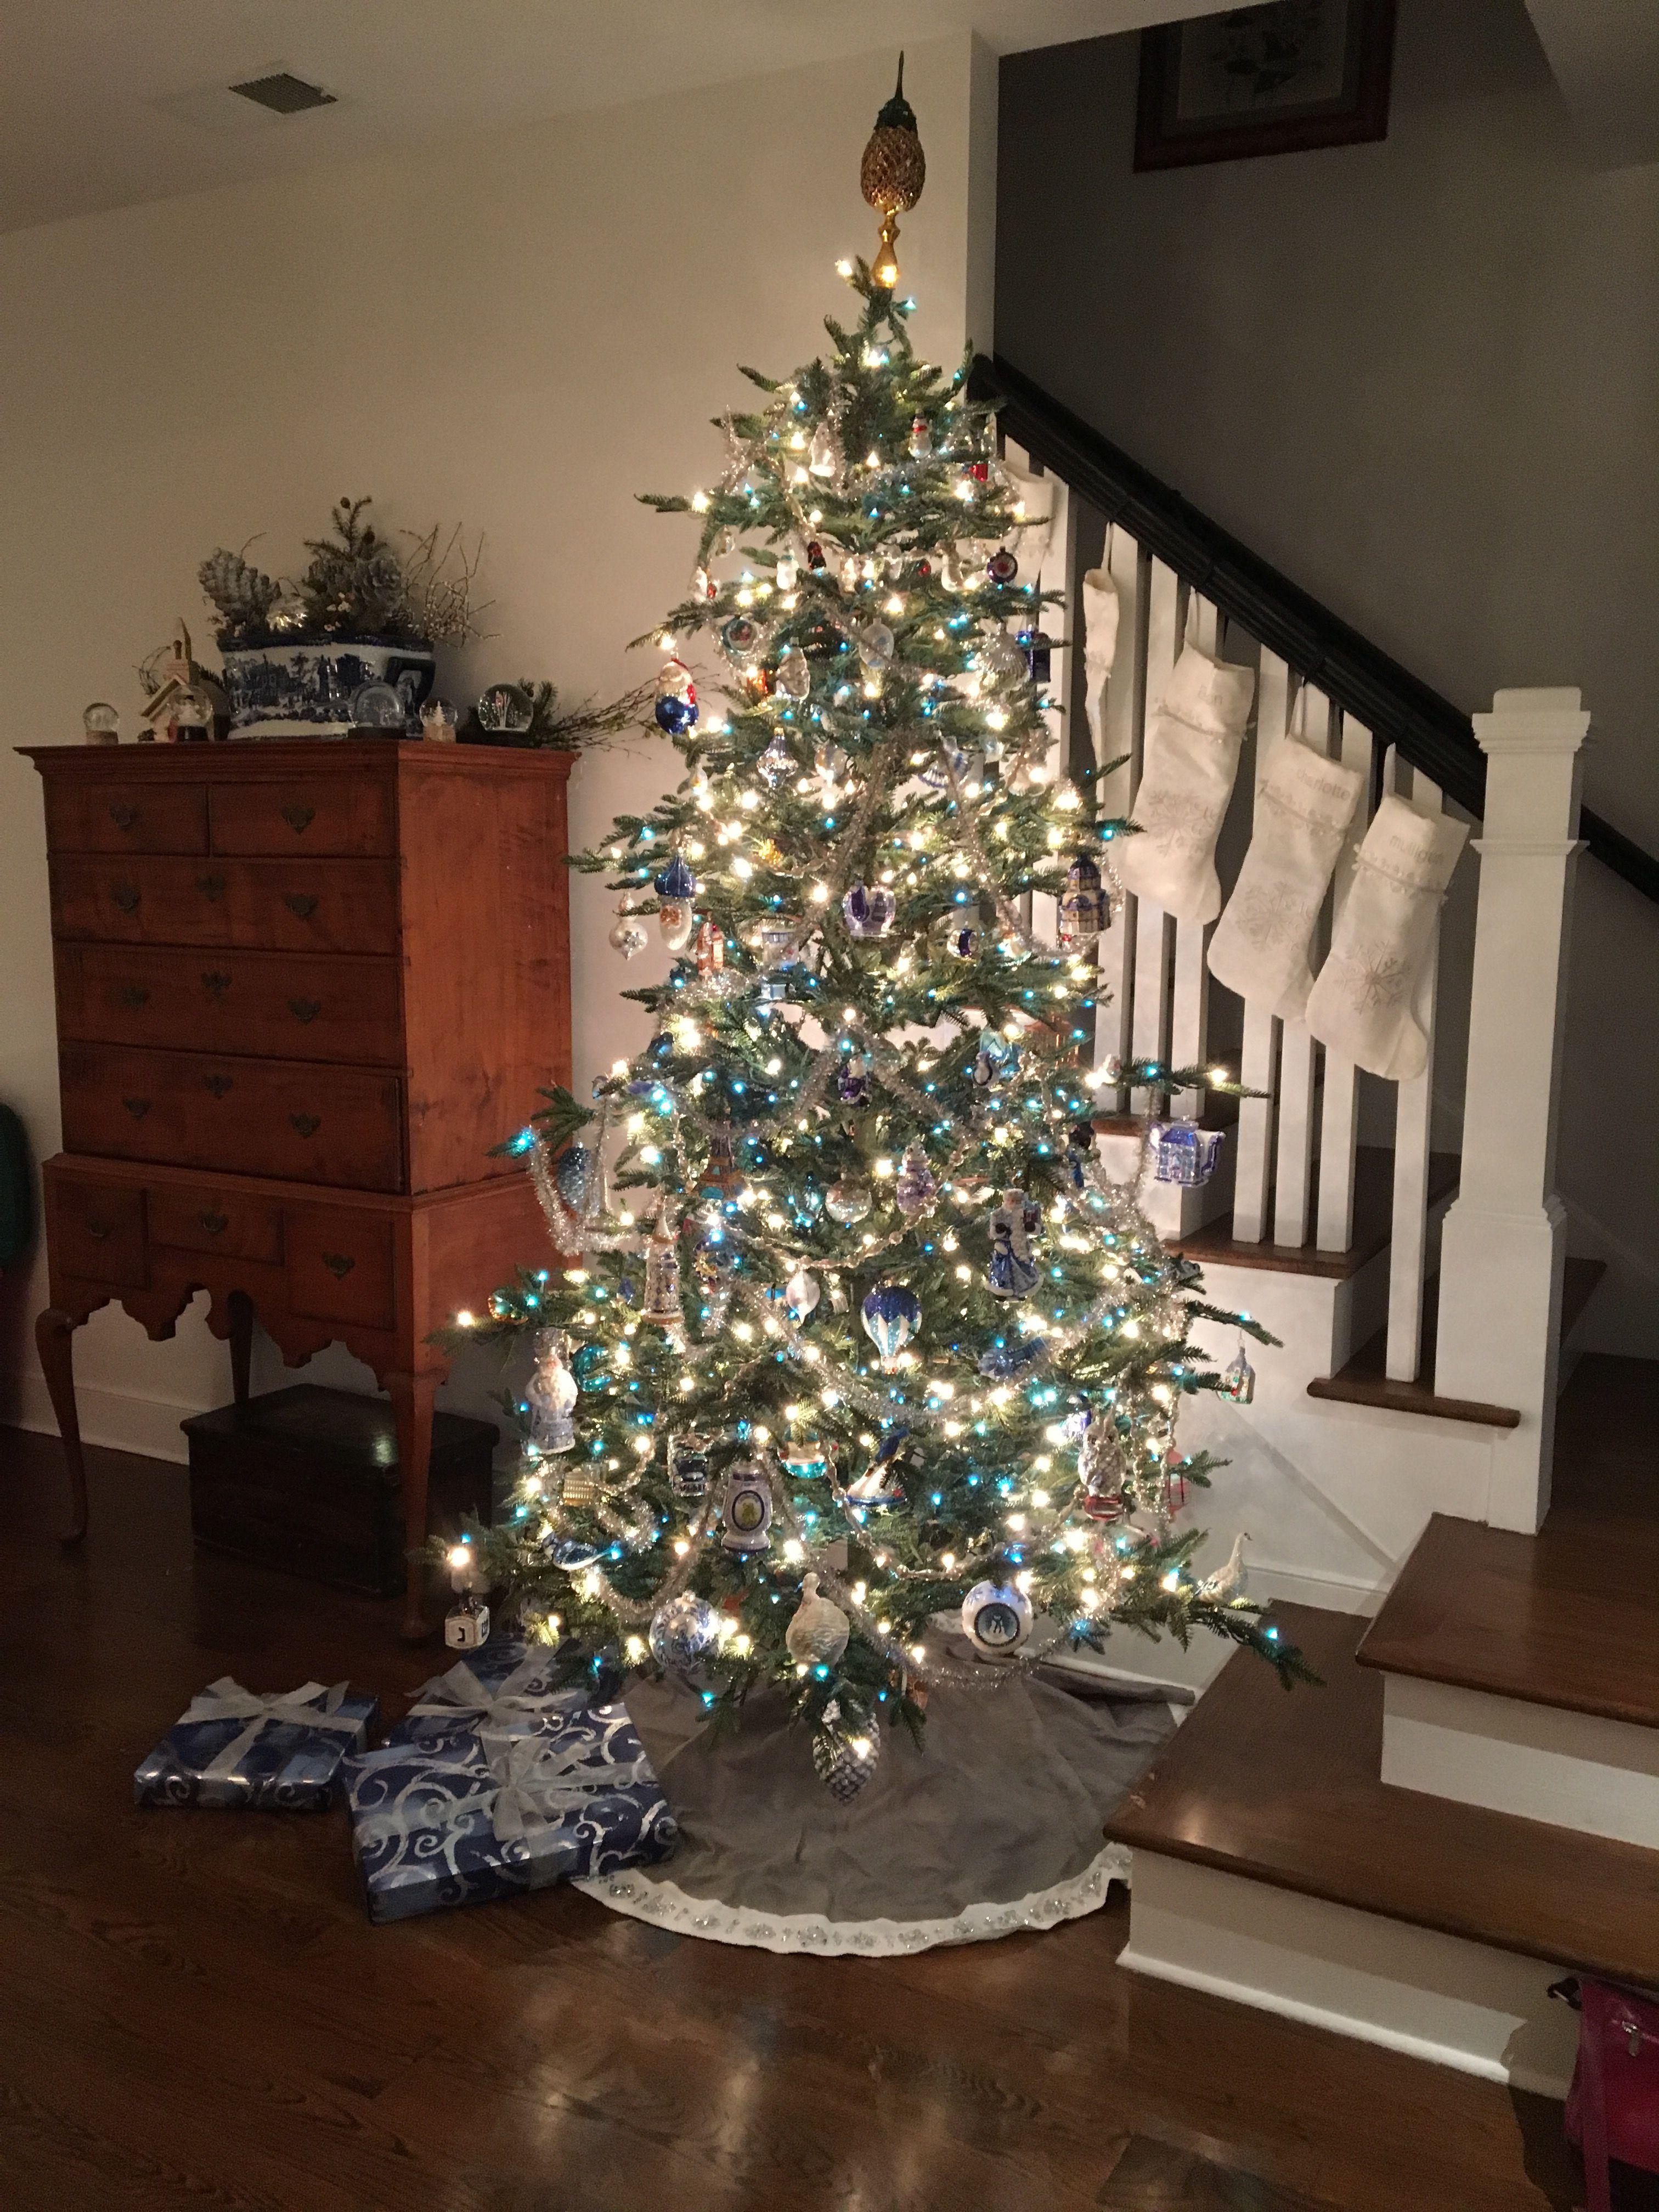 2019 Christmas Tree Blue And White Lights Silver Christmas